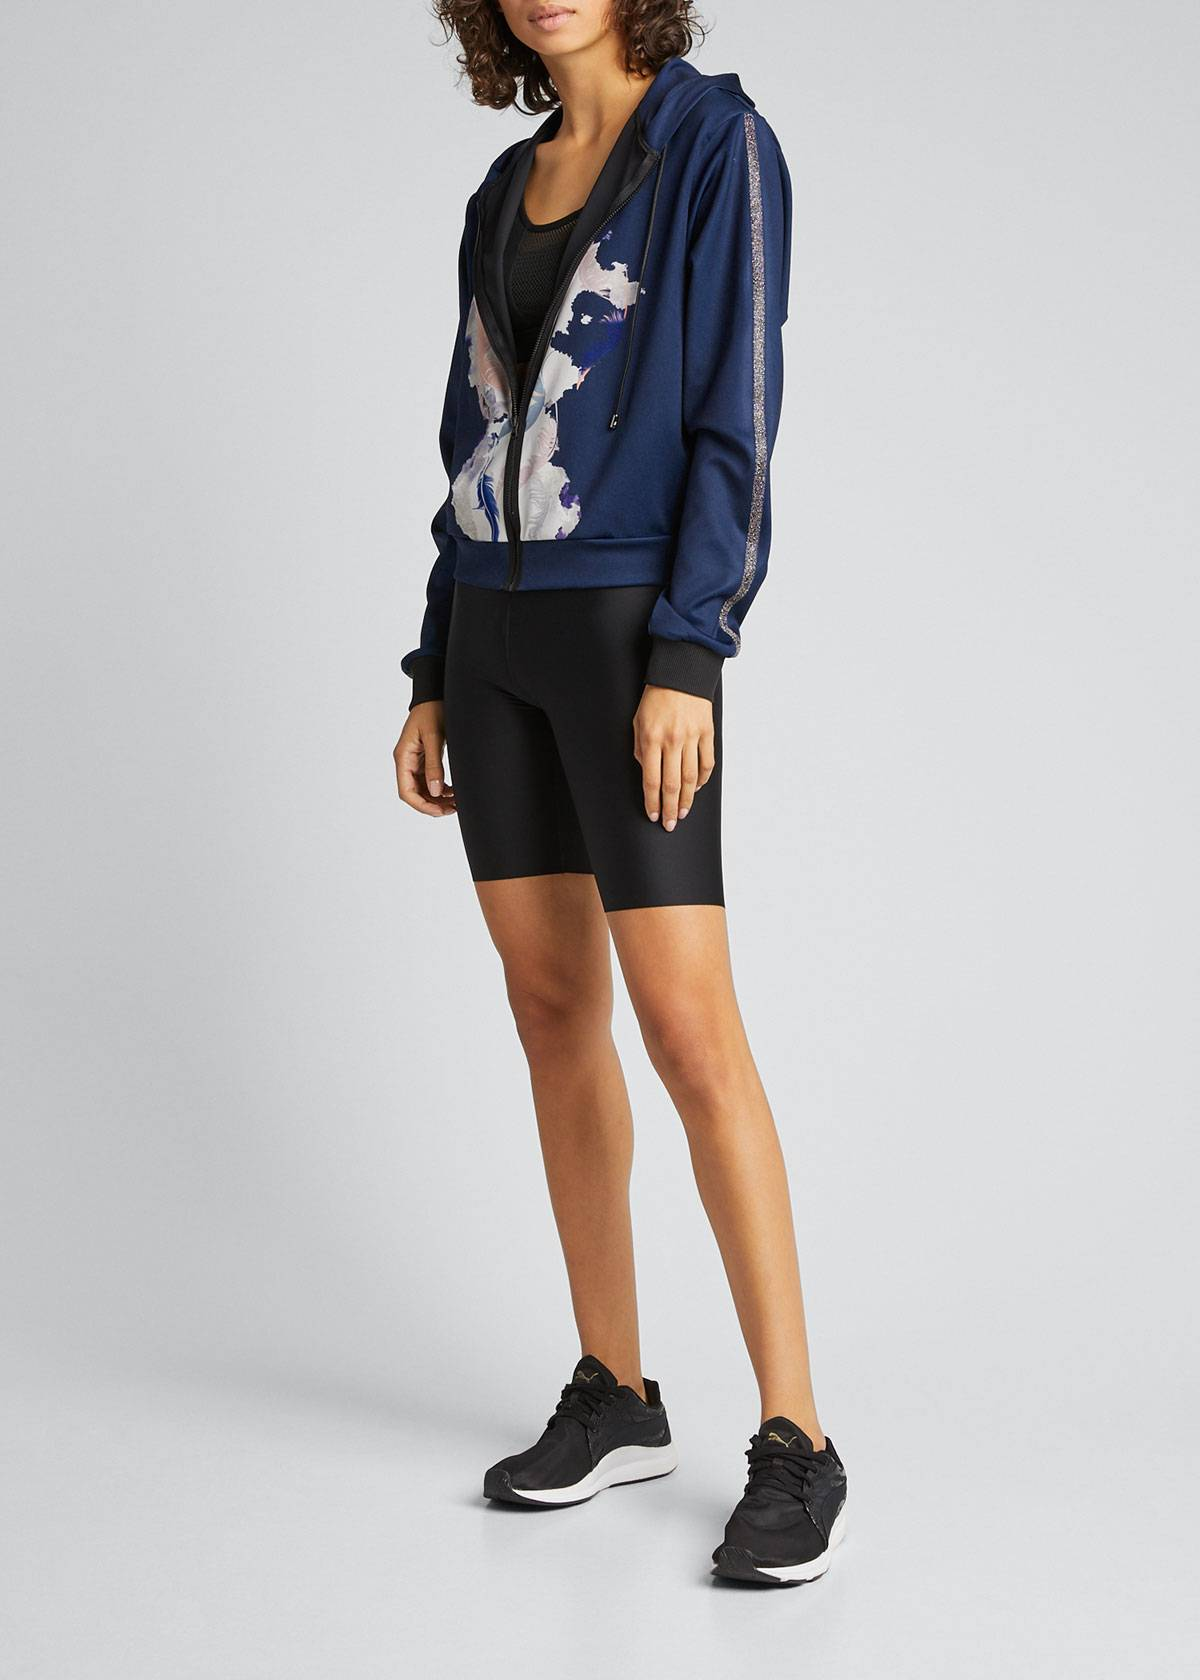 Ultracor Essential Venus Bike Shorts  - female - BLACK - Size: Large